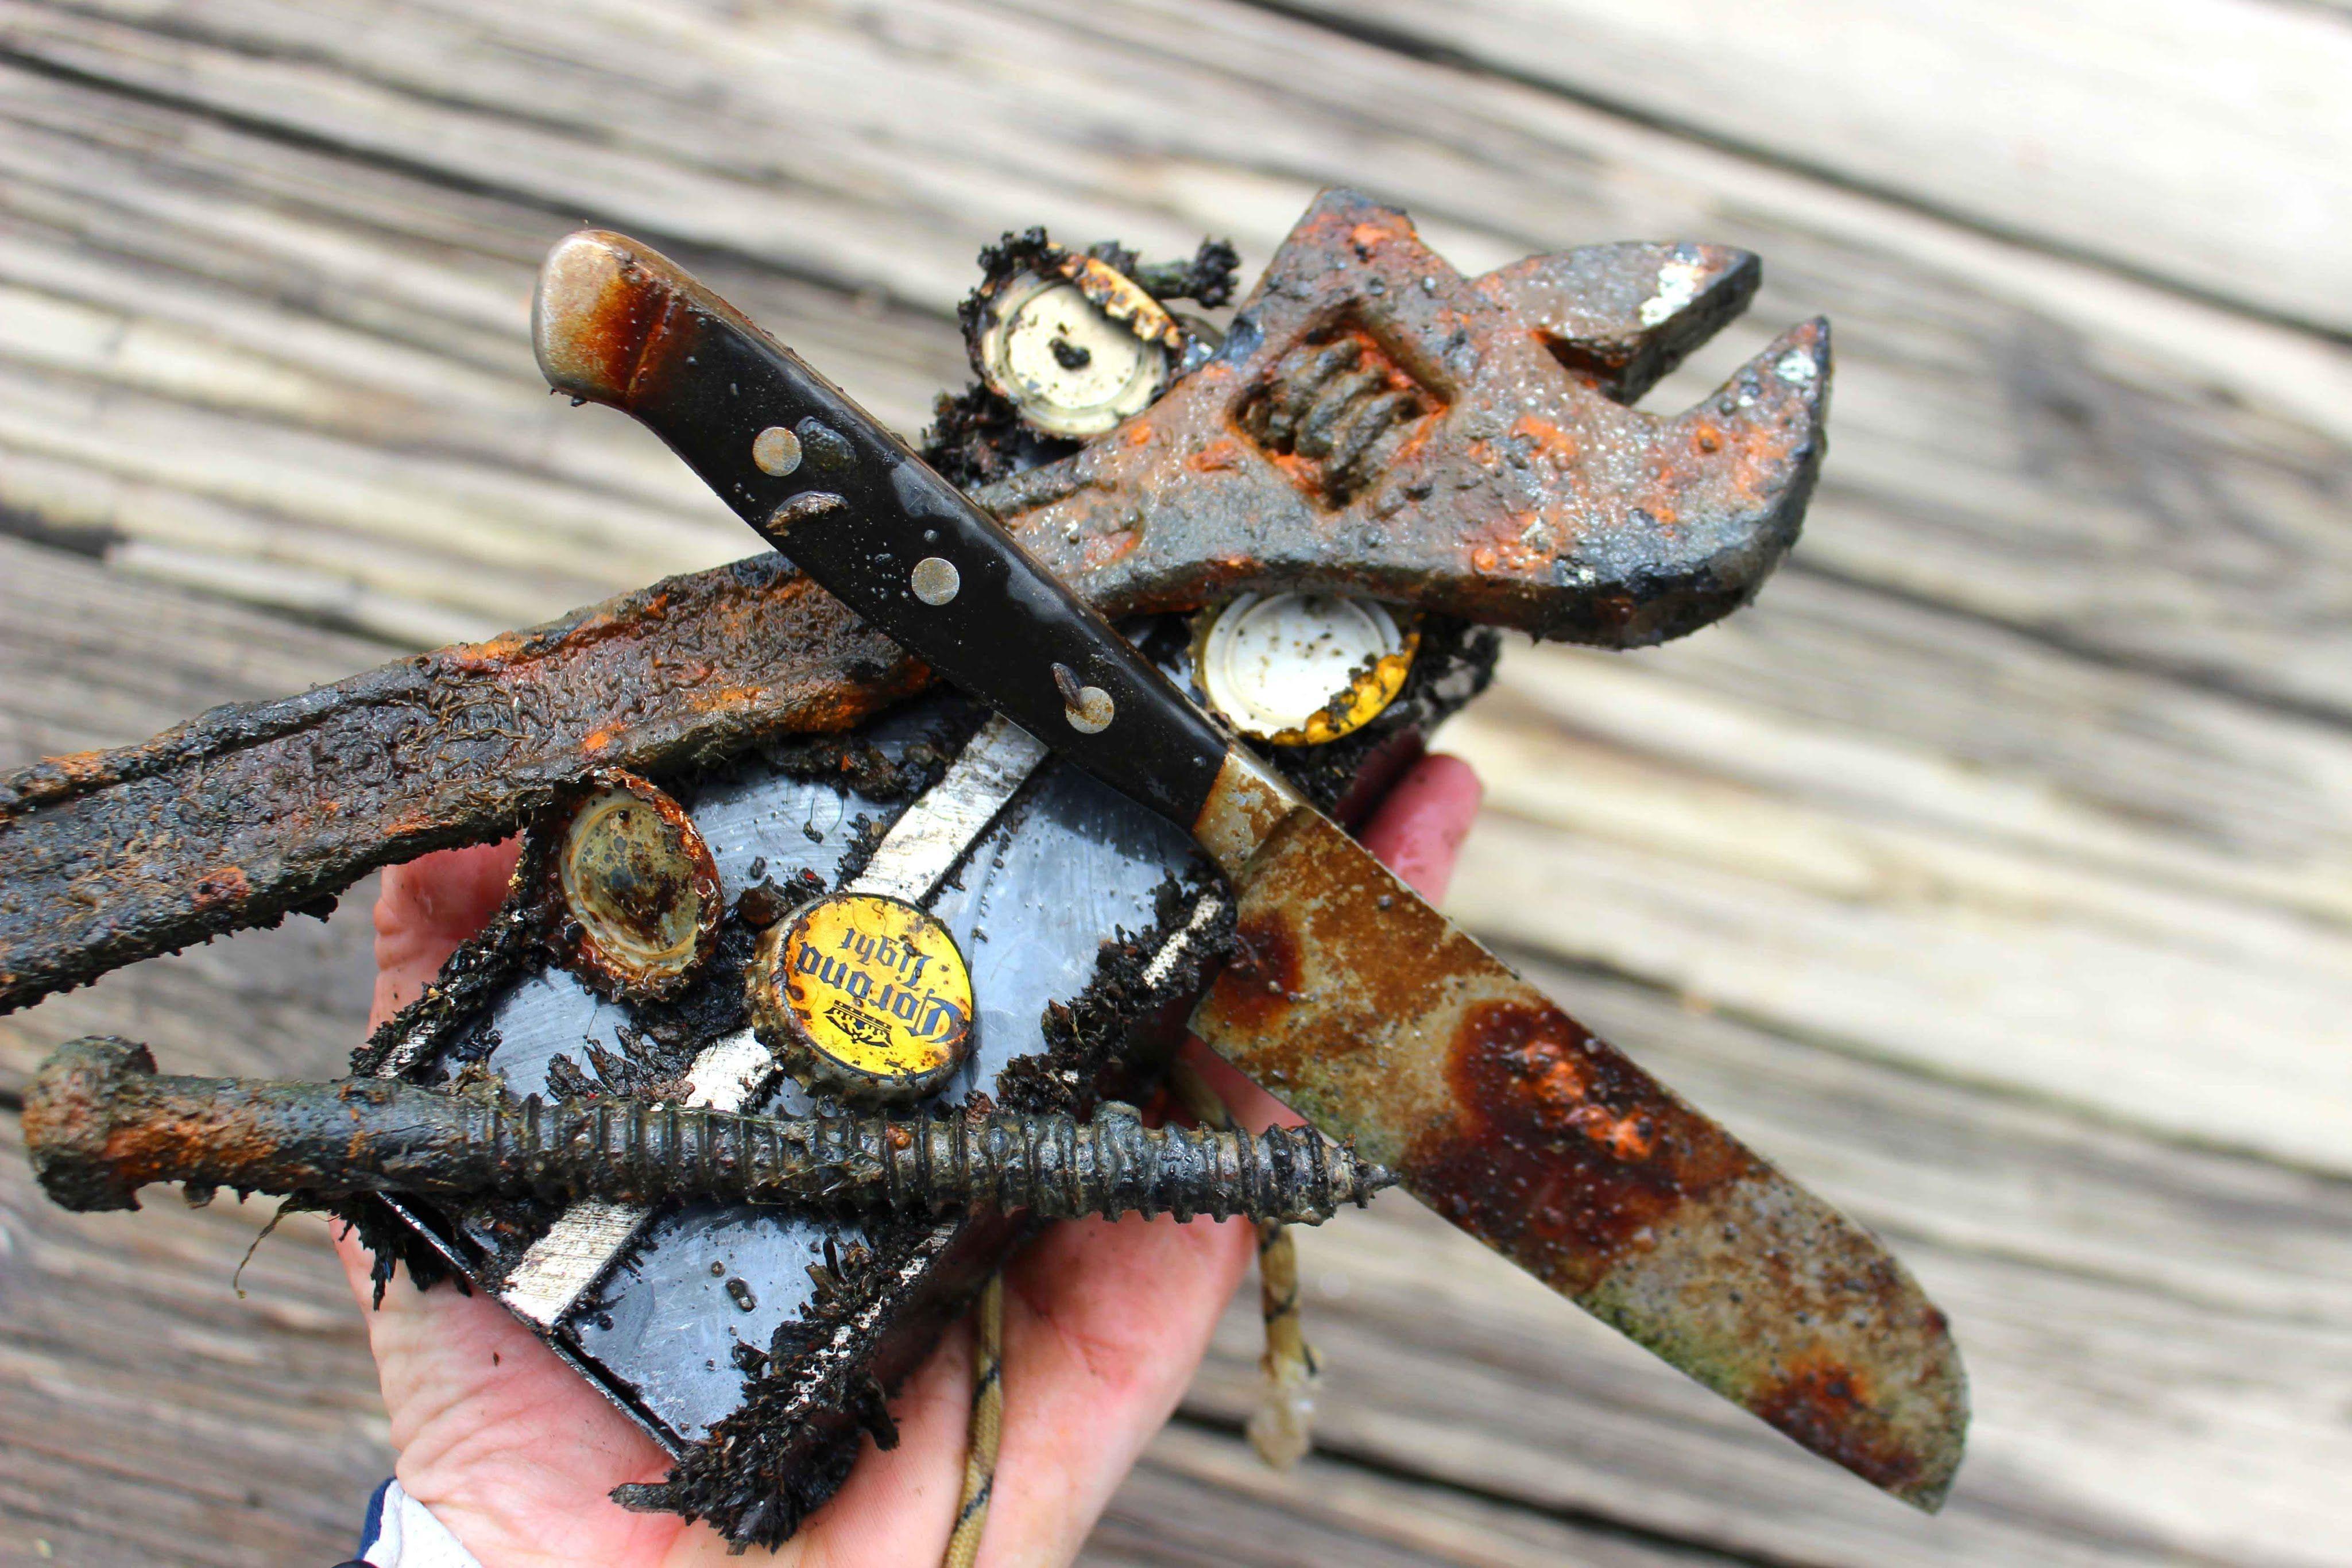 Fishing treasure relic hunting with